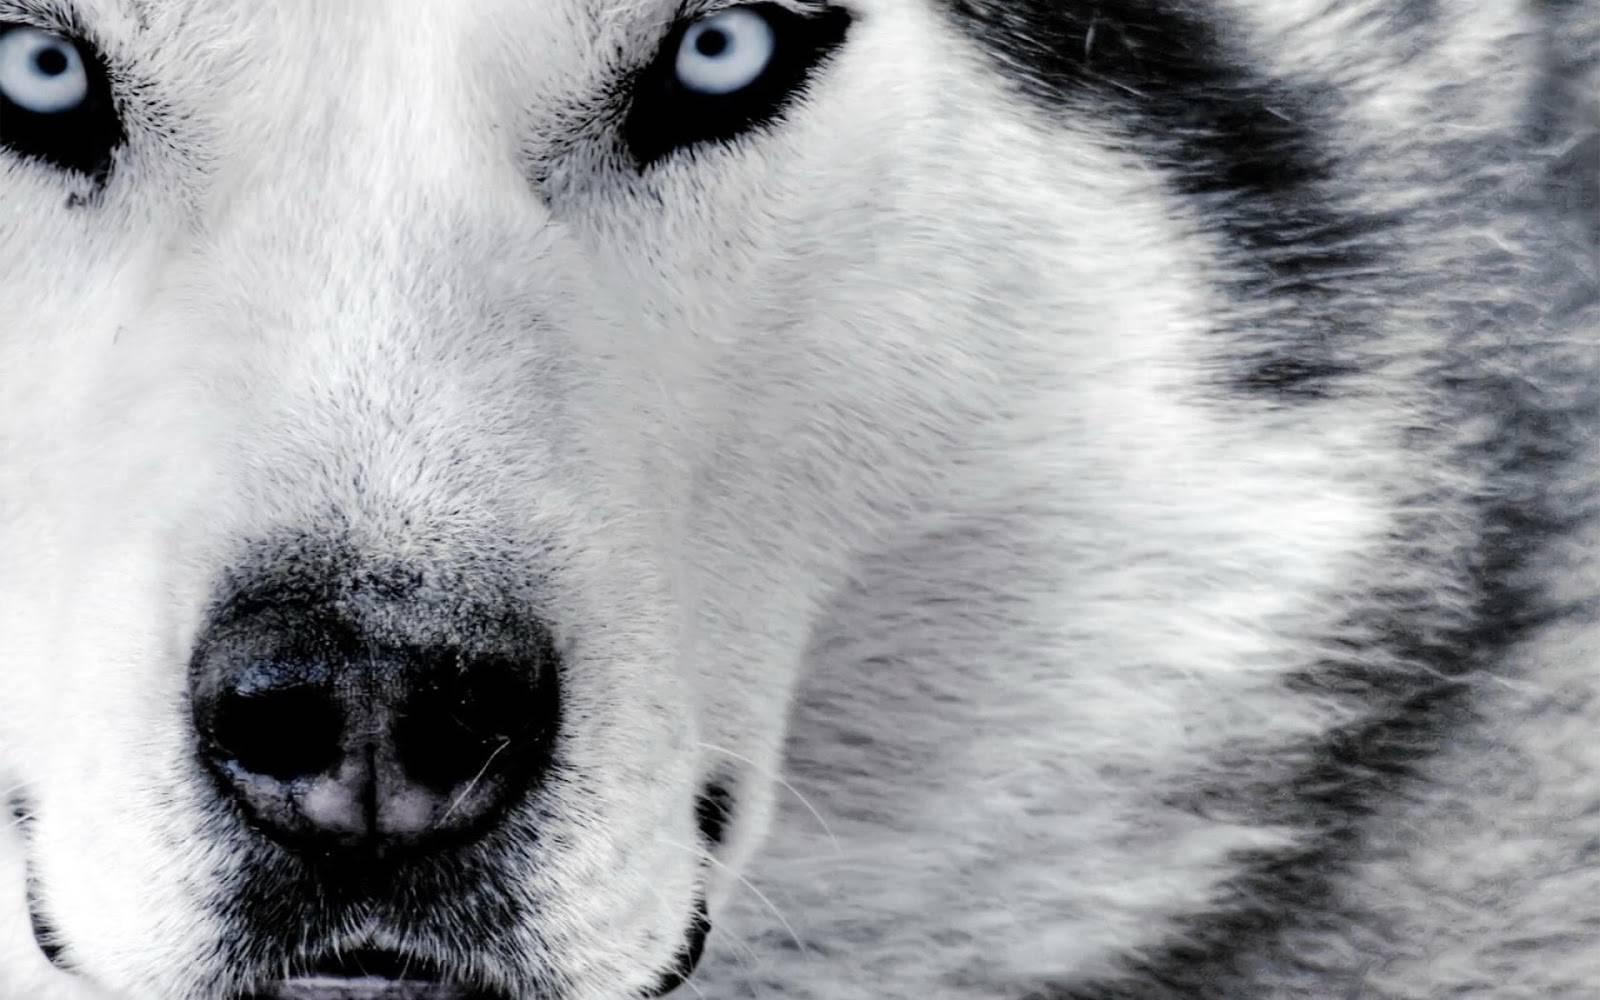 Baby Wolf Wallpaper - WallpaperSafari - photo#26